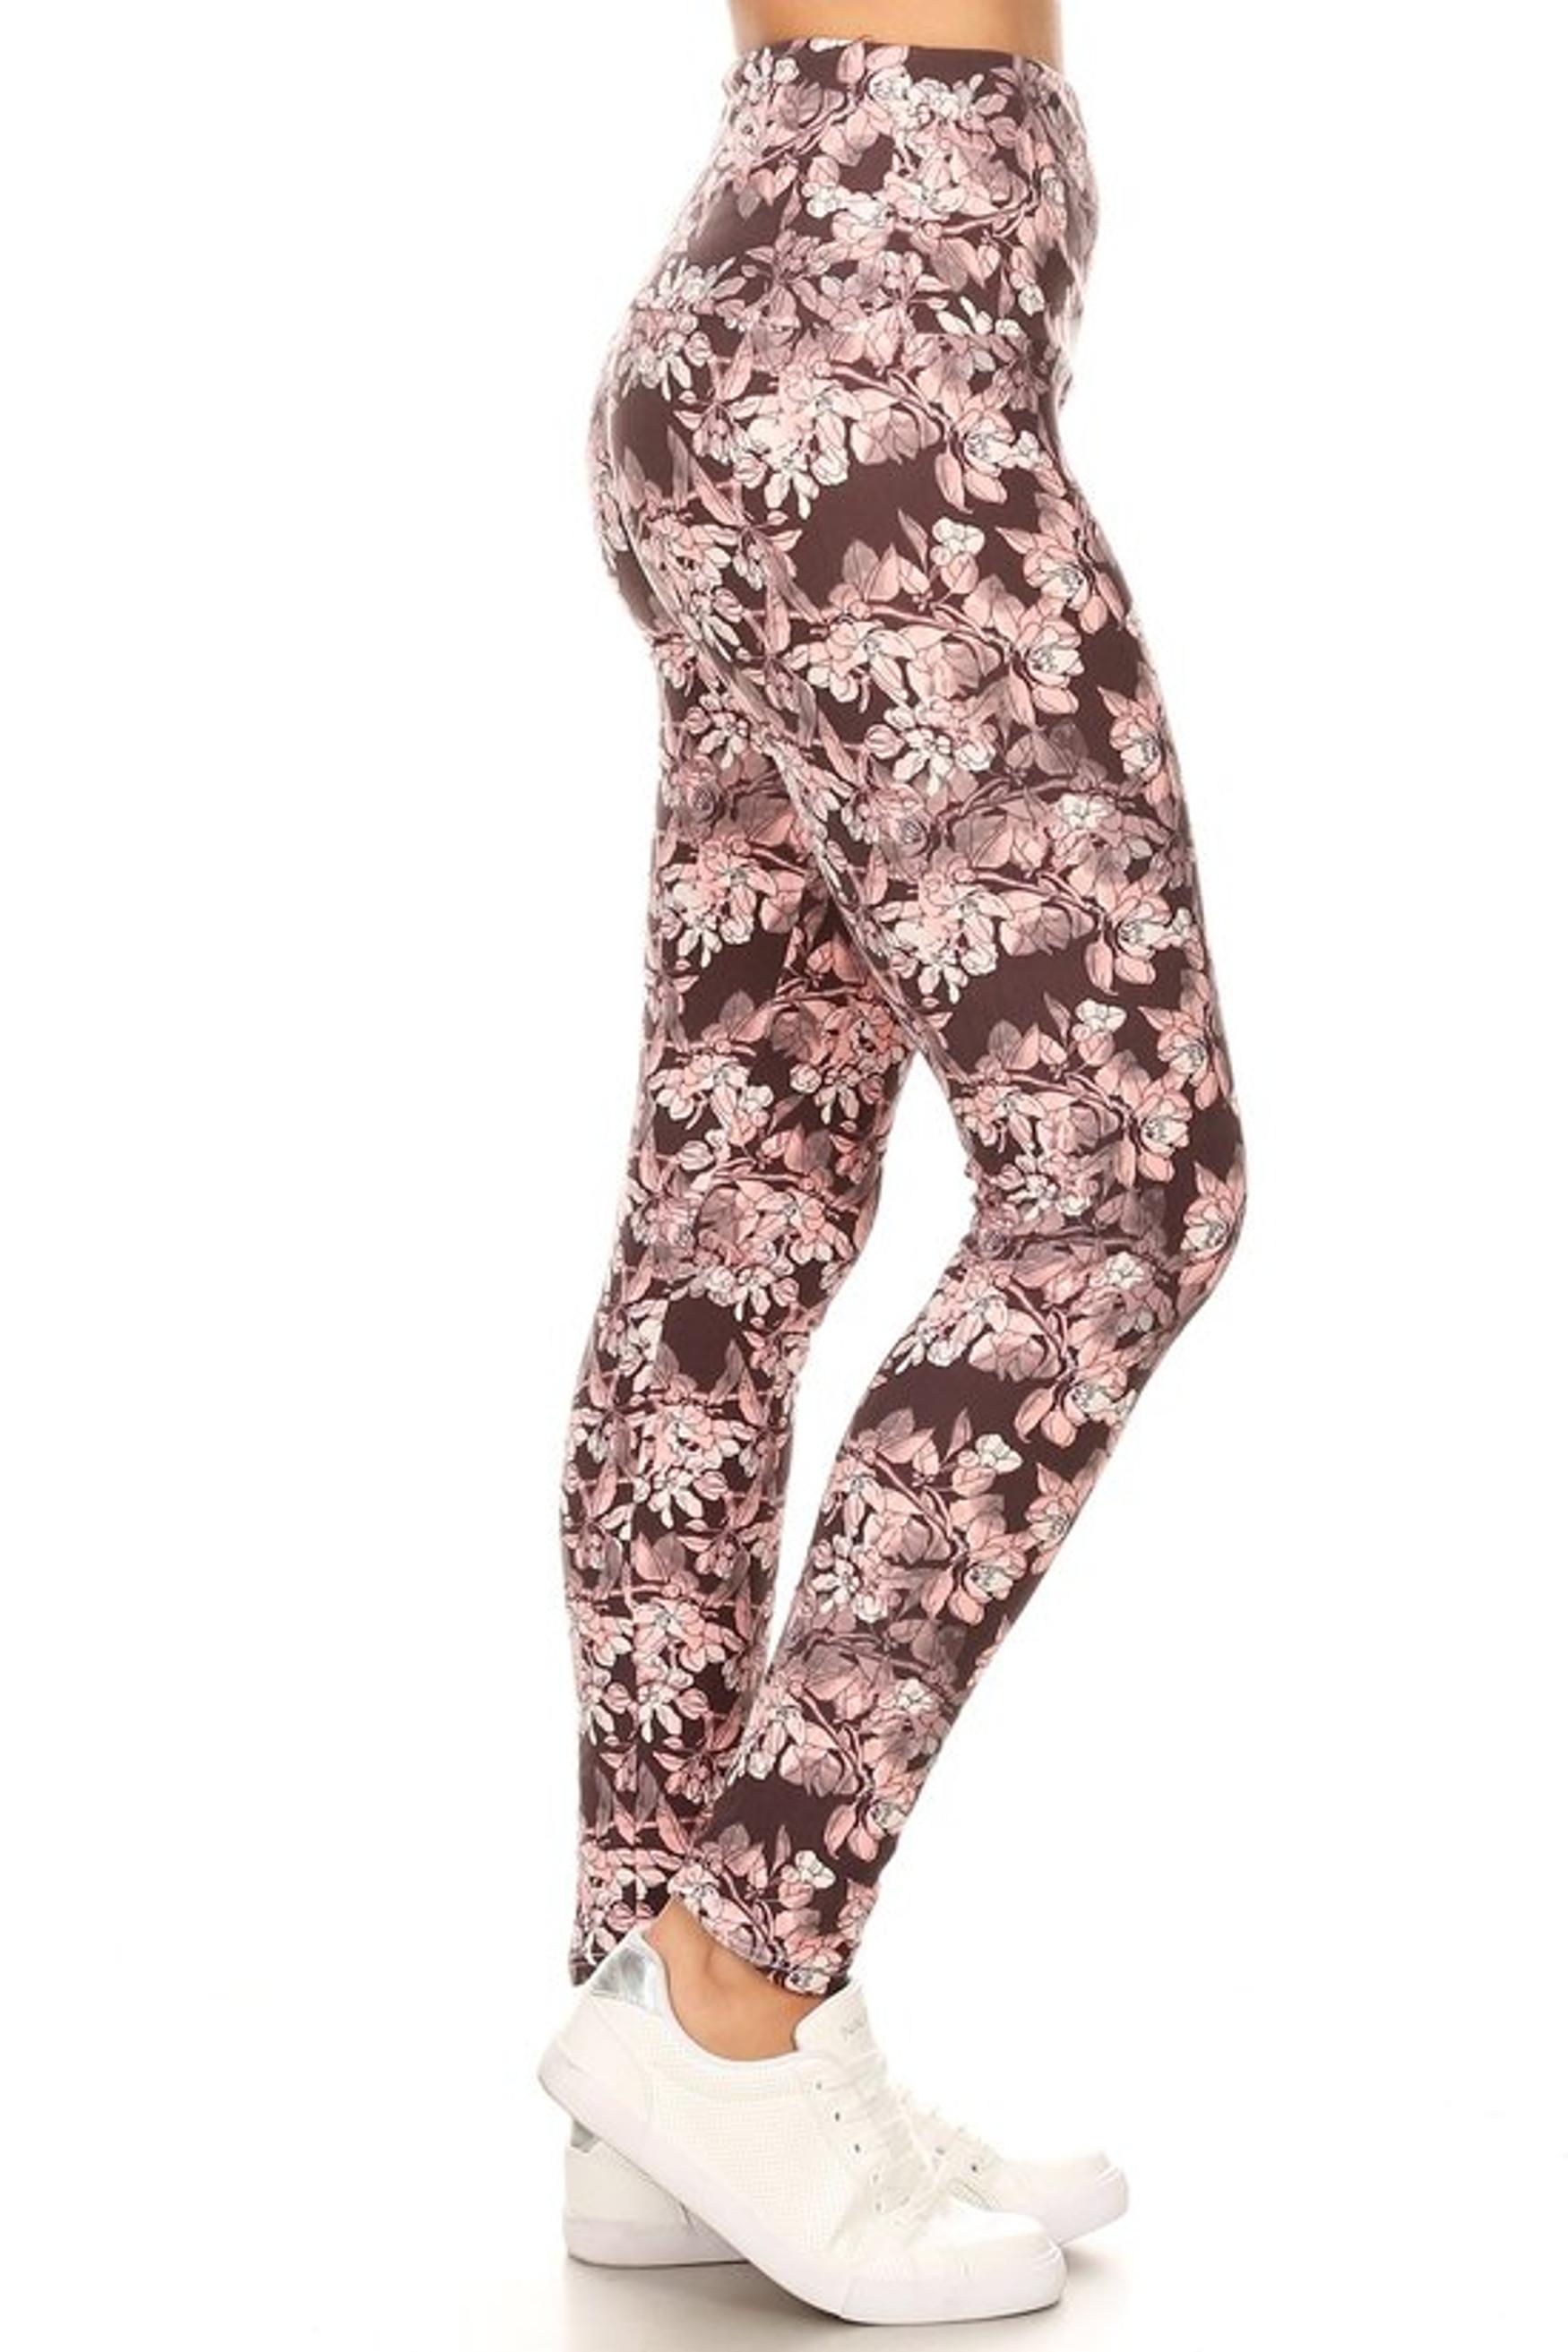 Brushed Beautiful Pink Floral Eden High Waist Leggings